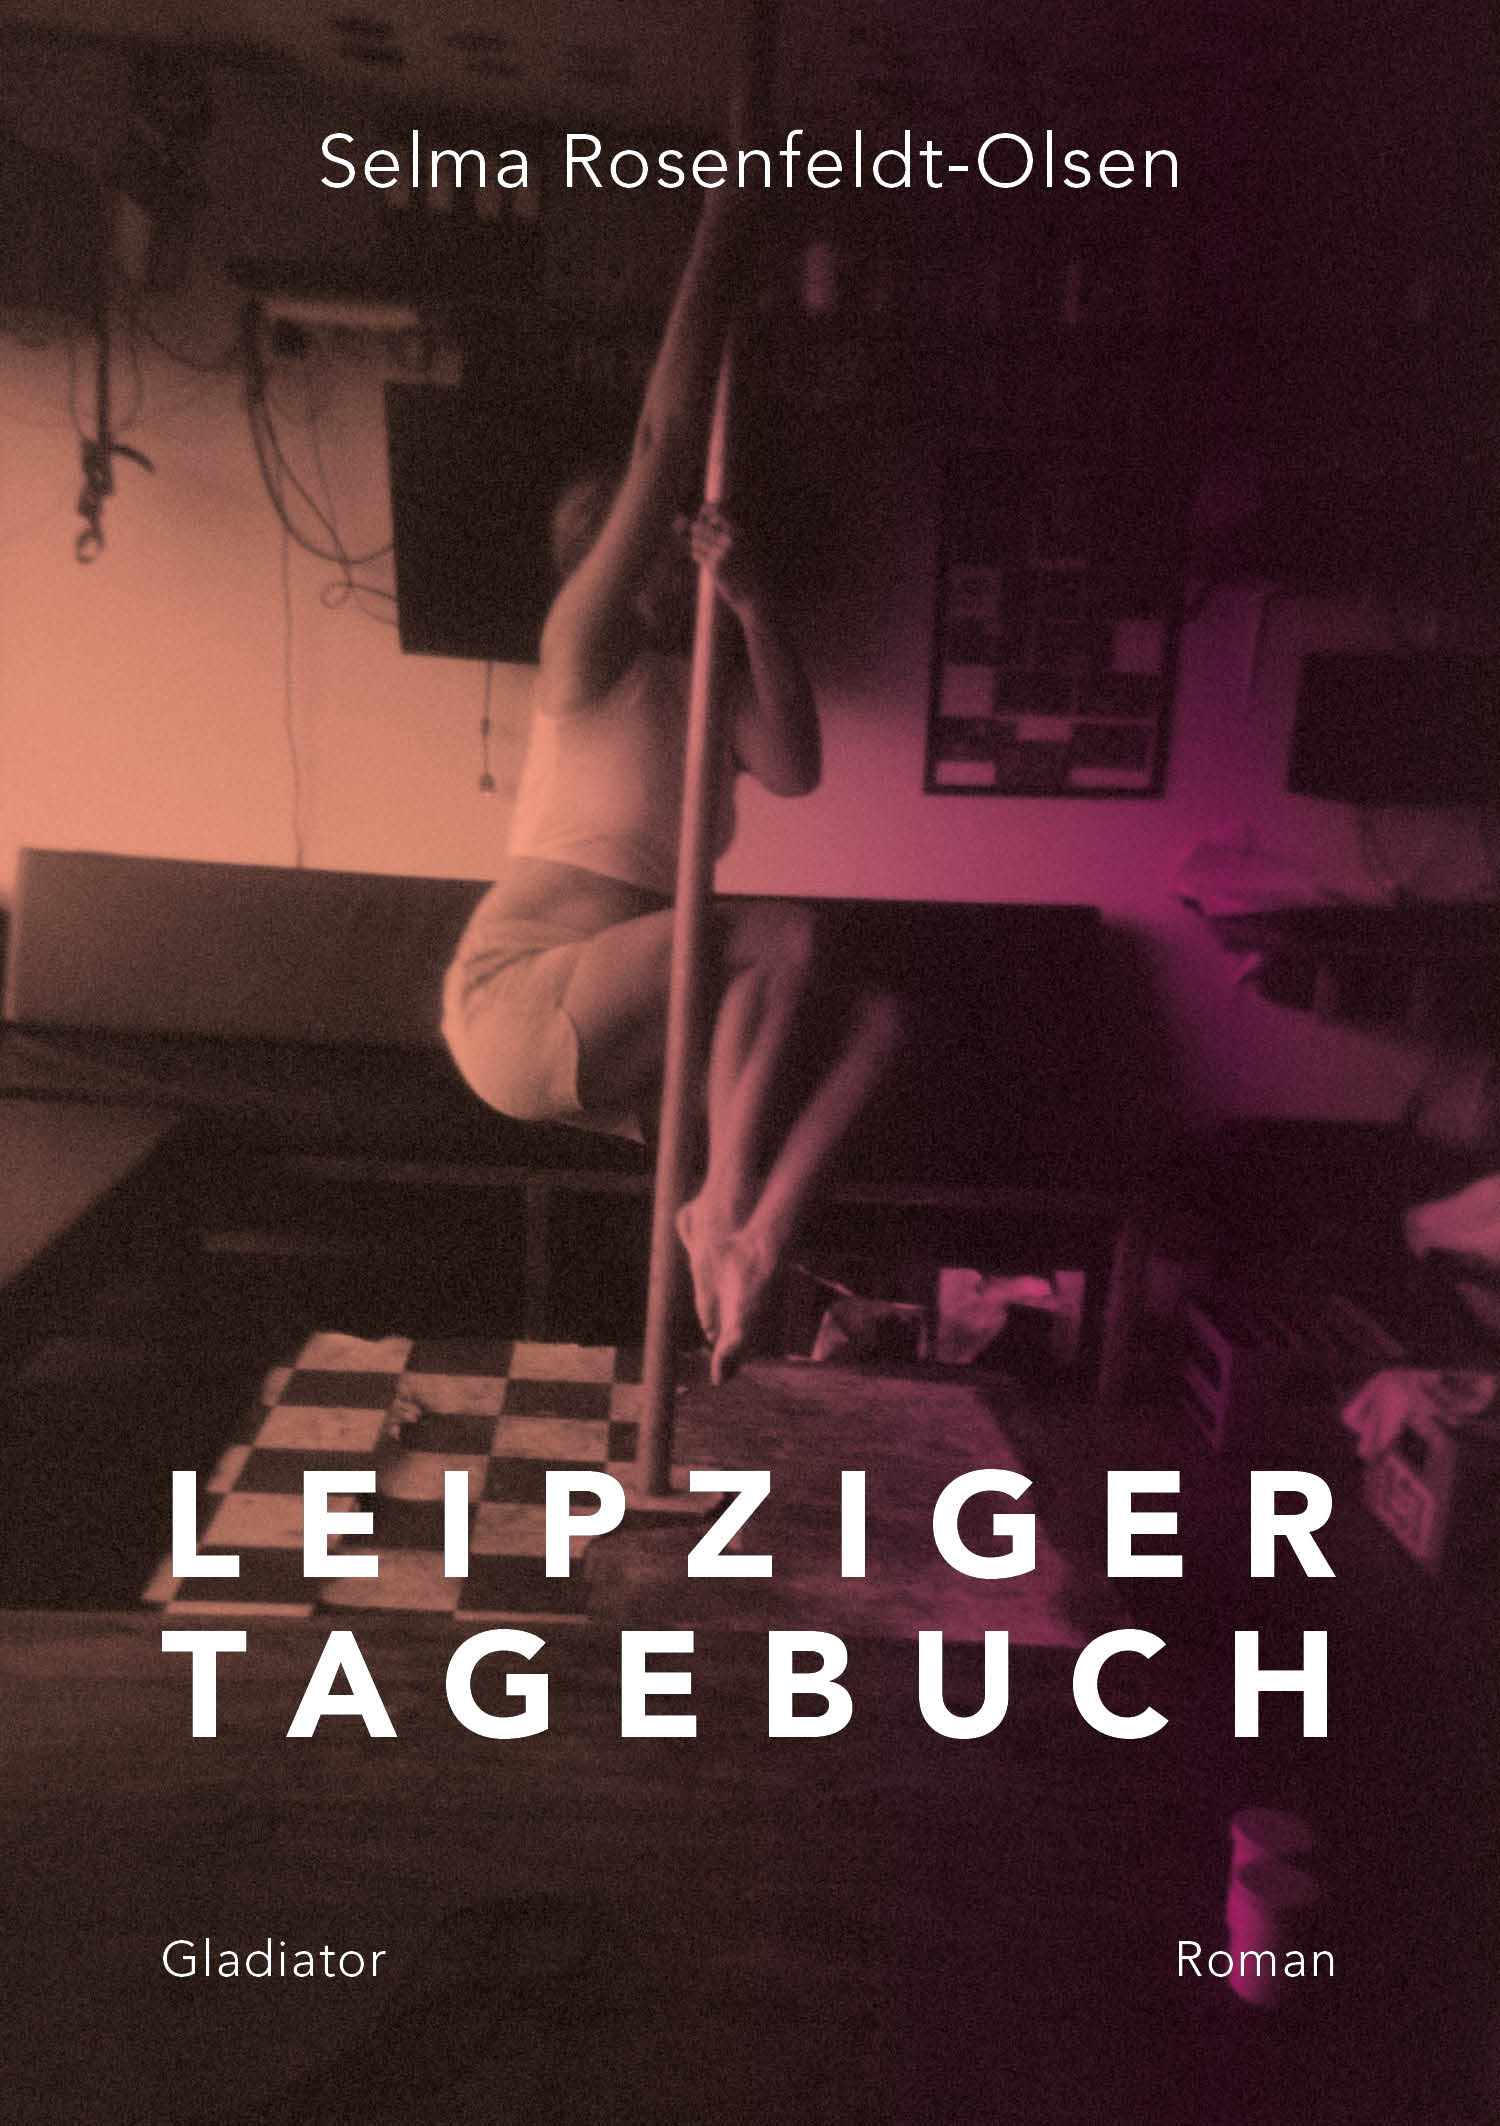 Selma-Rosenfeldt-Olsen_Leipziger-Tagebuch_lowres